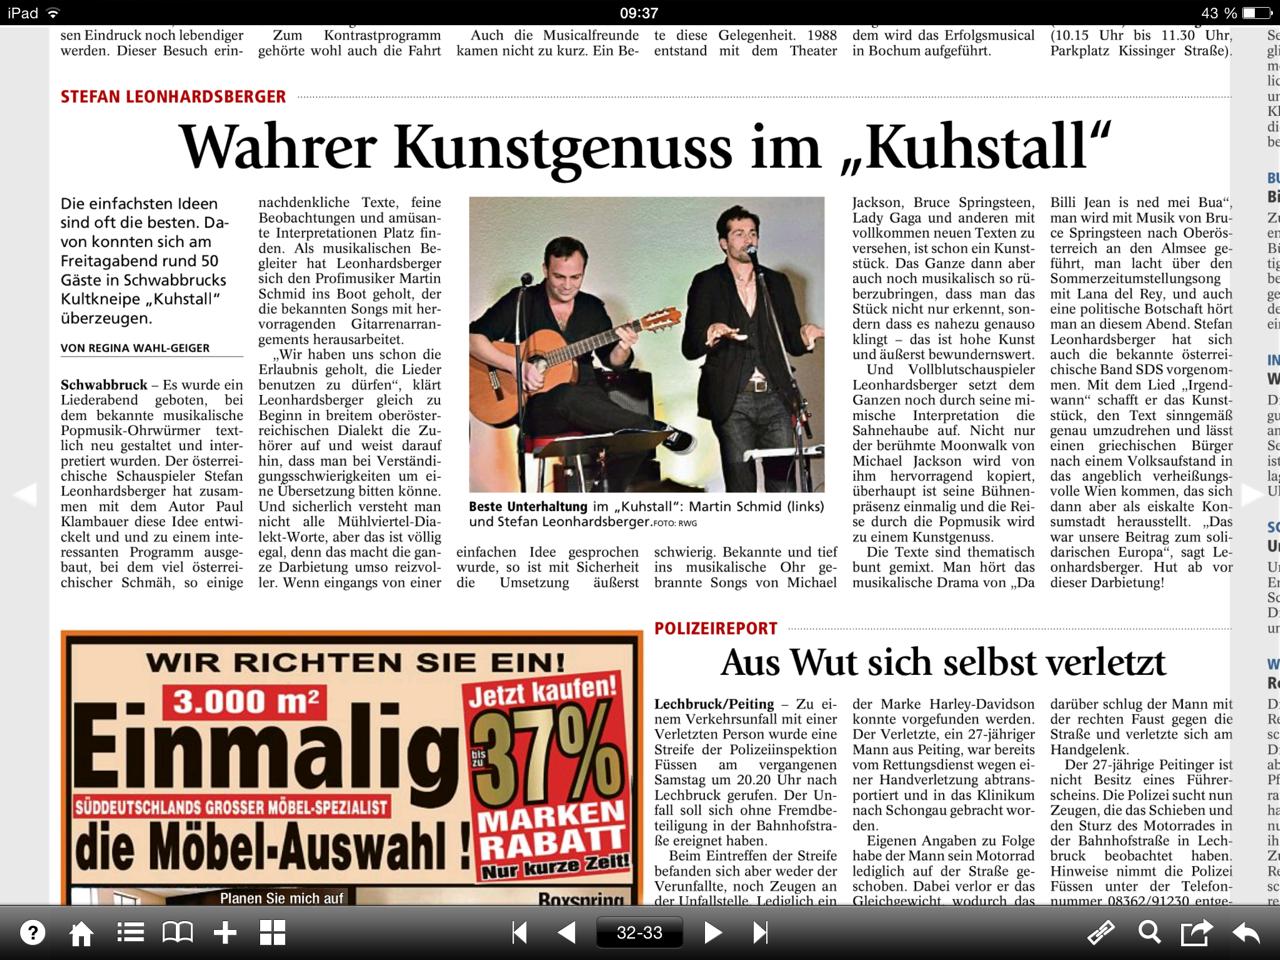 presse-kuhstall-schwabbach-12-09-2014